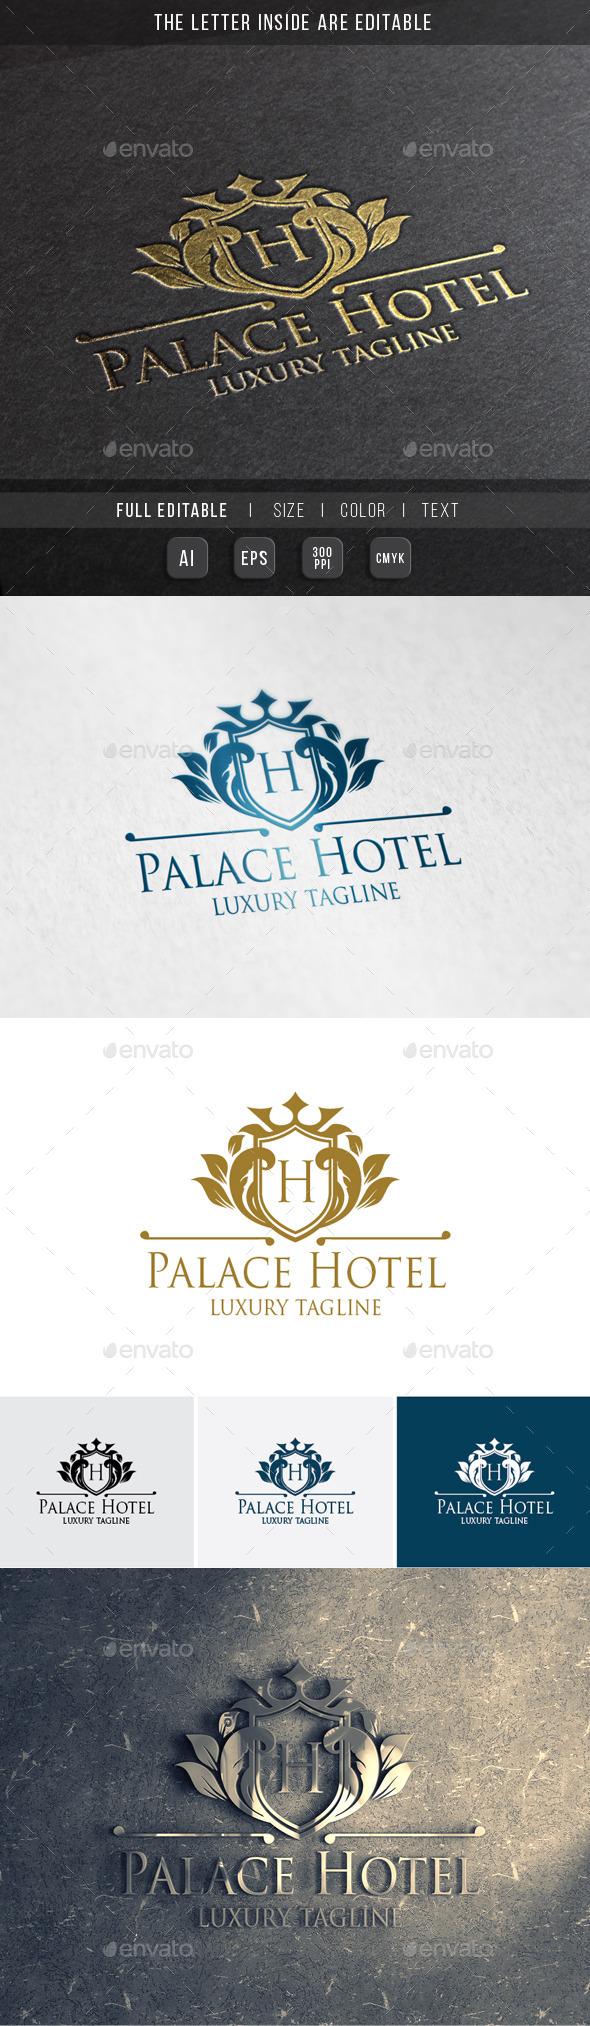 Royal Palace - Luxury Hotel - Crests Logo Templates